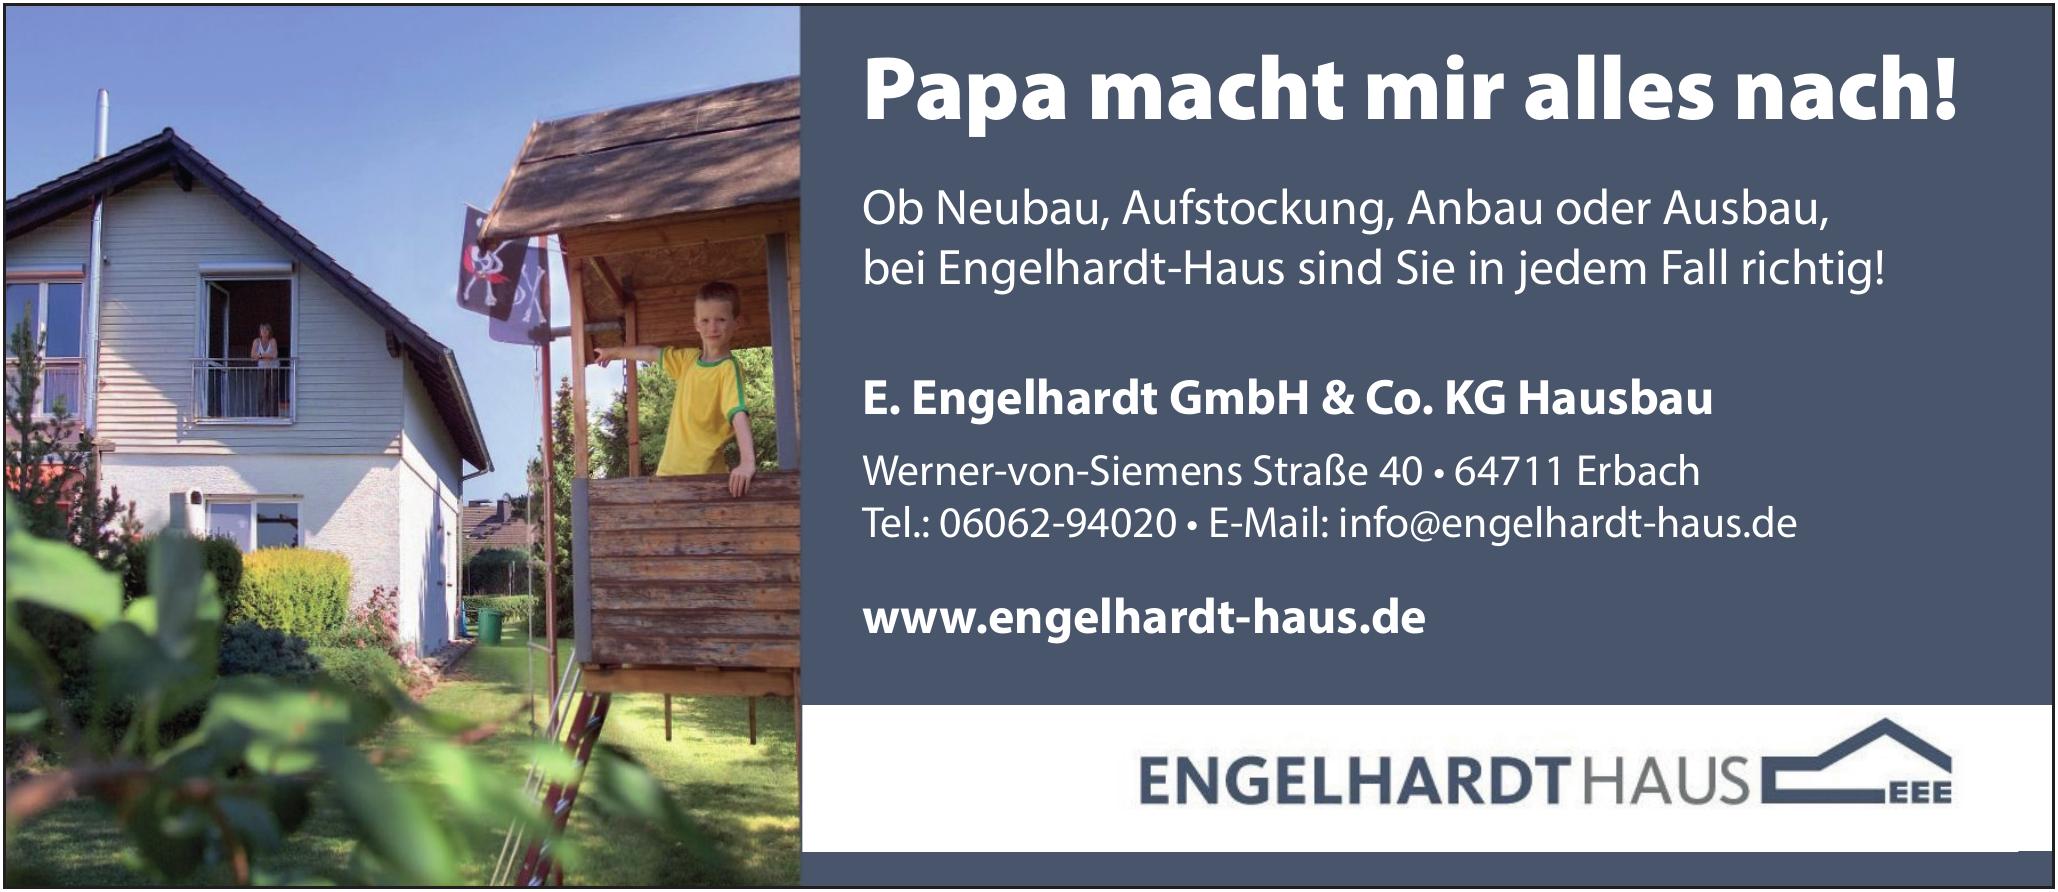 E. Engelhardt GmbH & Co. KG Hausbau